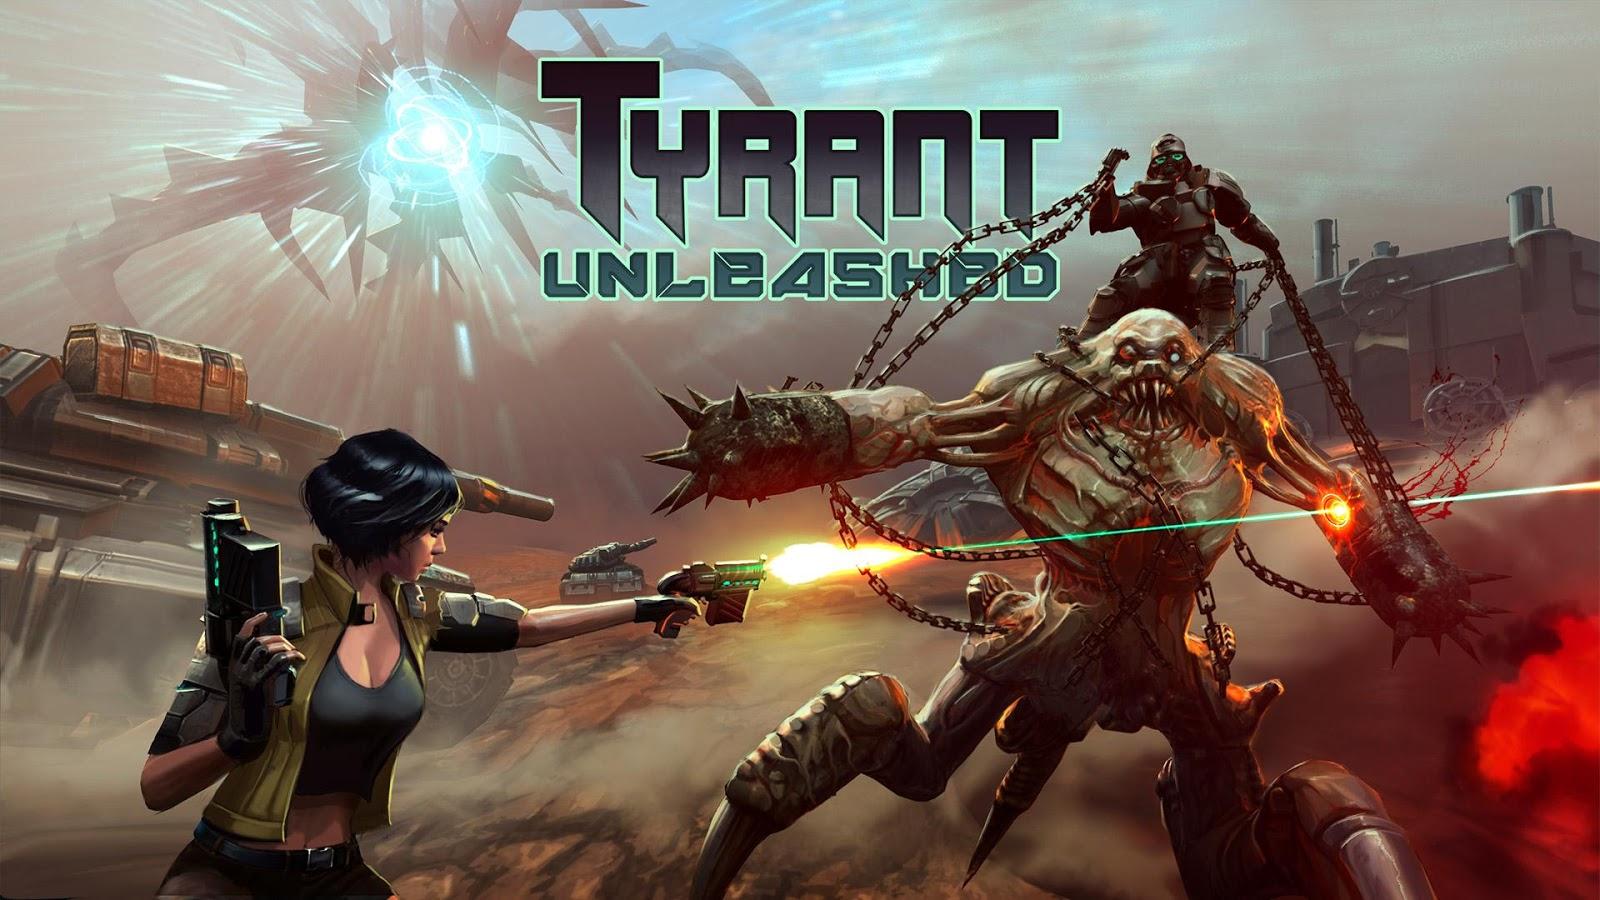 Fuse Xbox 360 Mod Tool : Tyrant unleashed cheats hacks tips